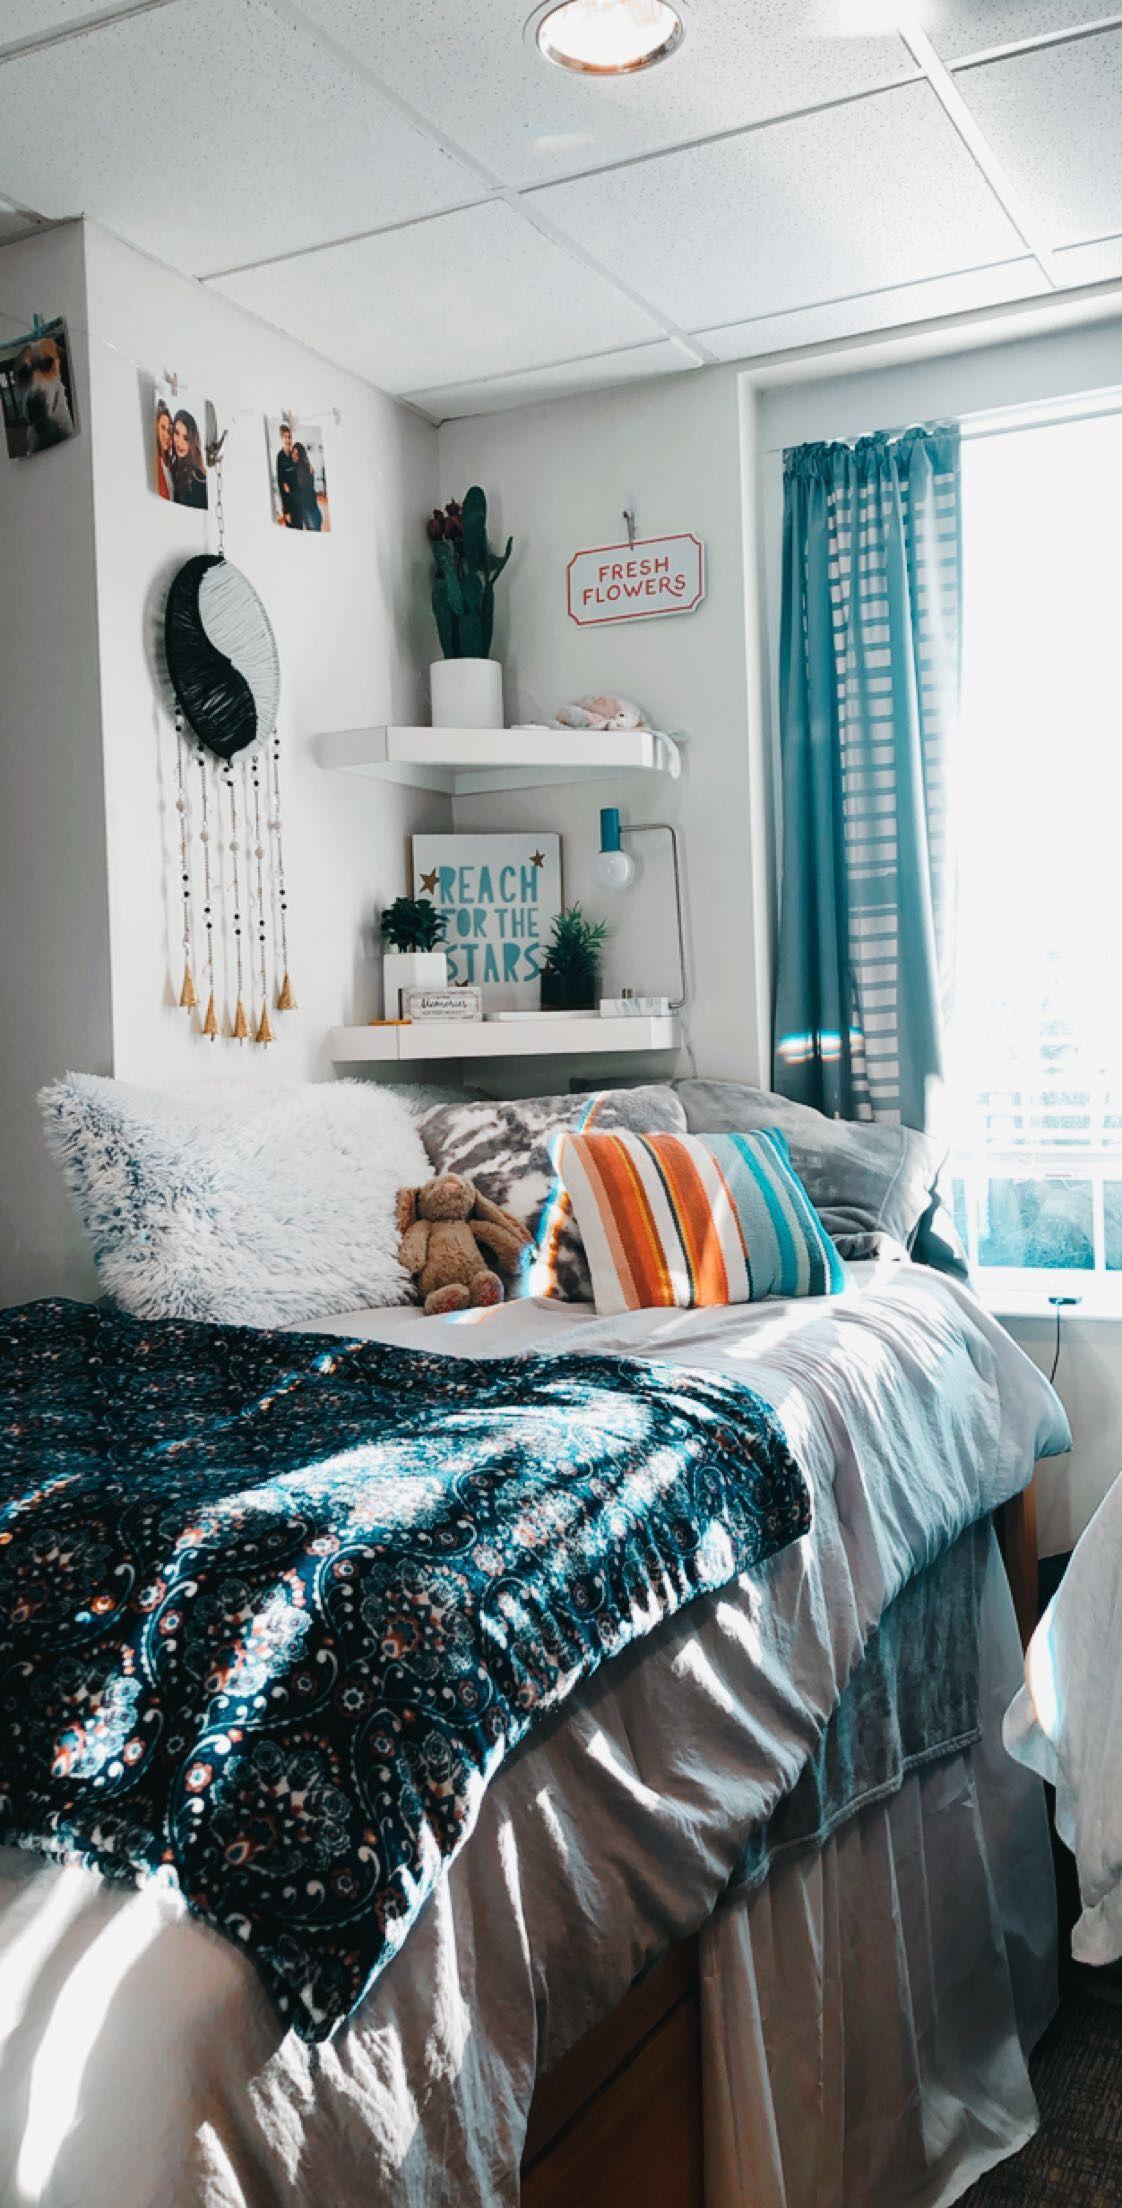 Aesthetic Dorm Room: #dorm #college #decor #aesthetic #freshman #cute #pretty